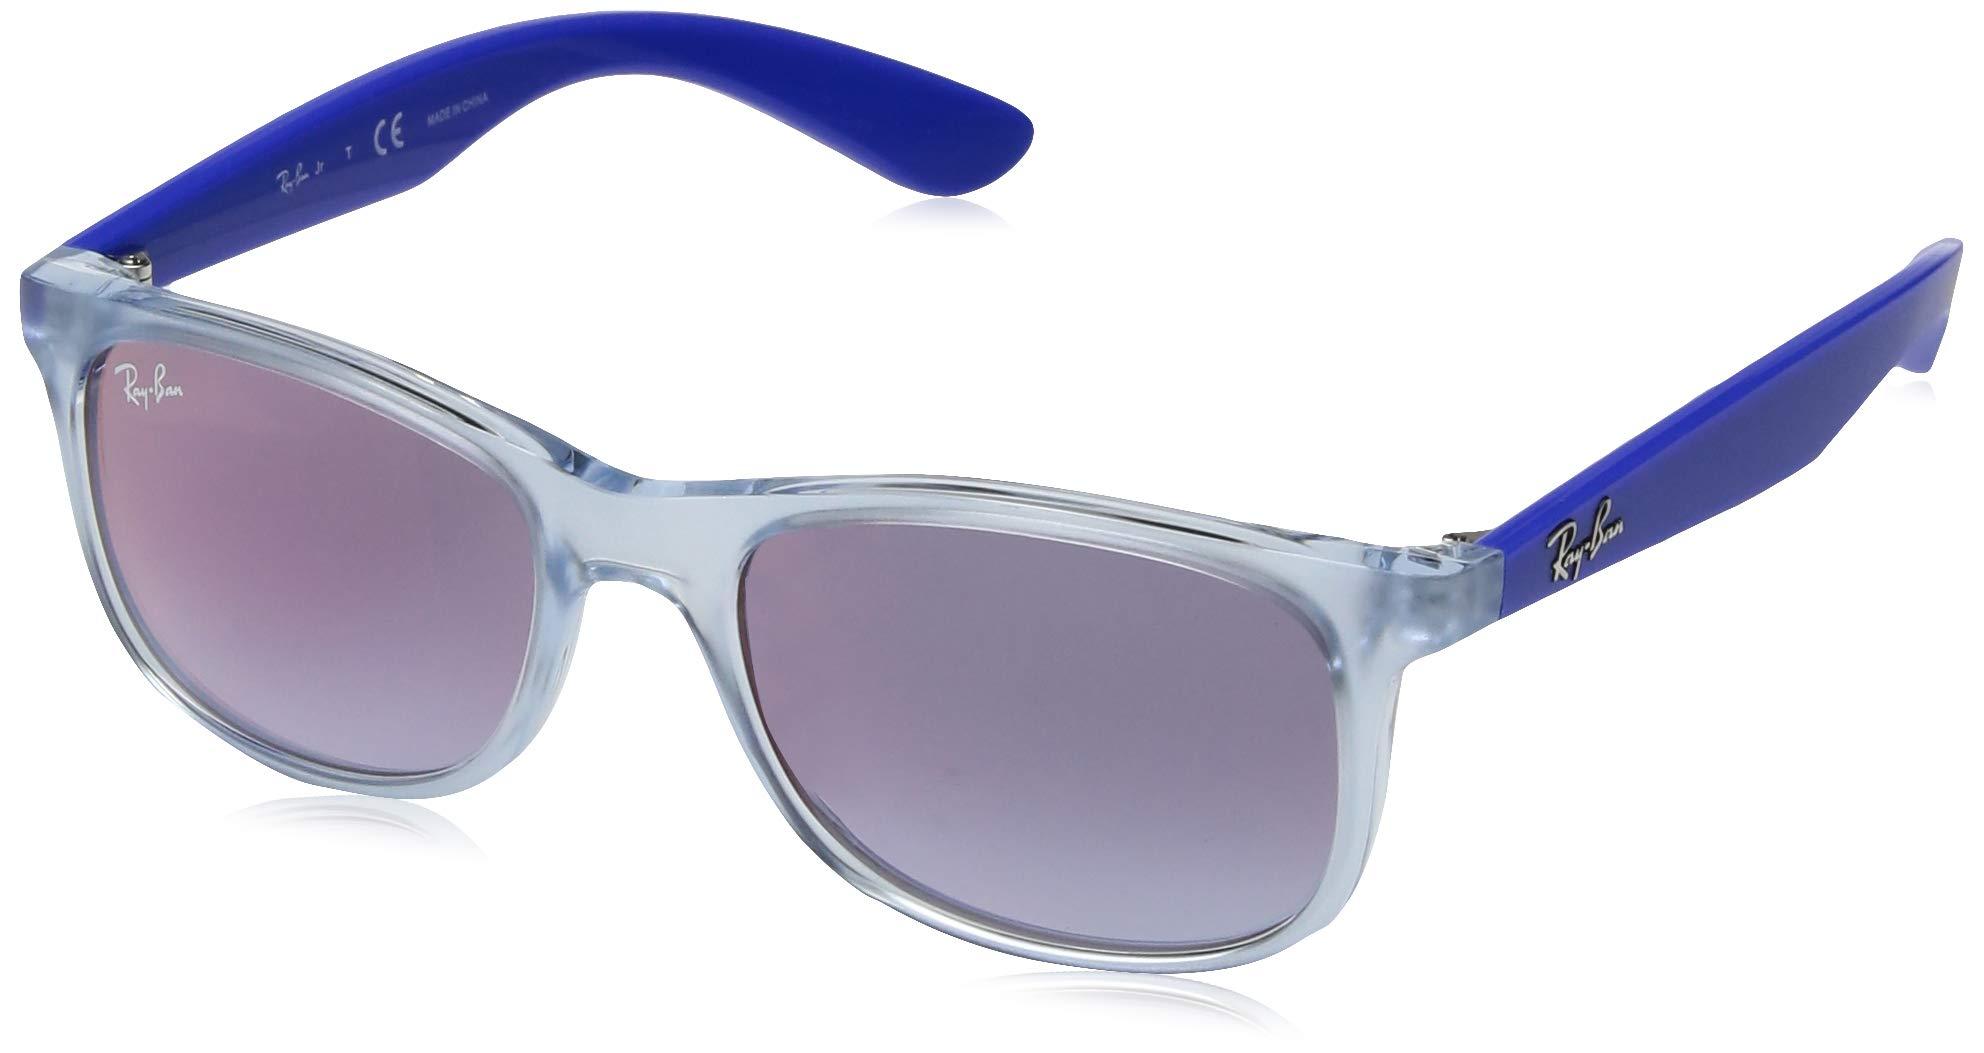 RAY-BAN JUNIOR Kids' RJ9062S Rectangular Kids Sunglasses, Transparent Light Blue/Blue Red Gradient Mirror, 48 mm by RAY-BAN JUNIOR